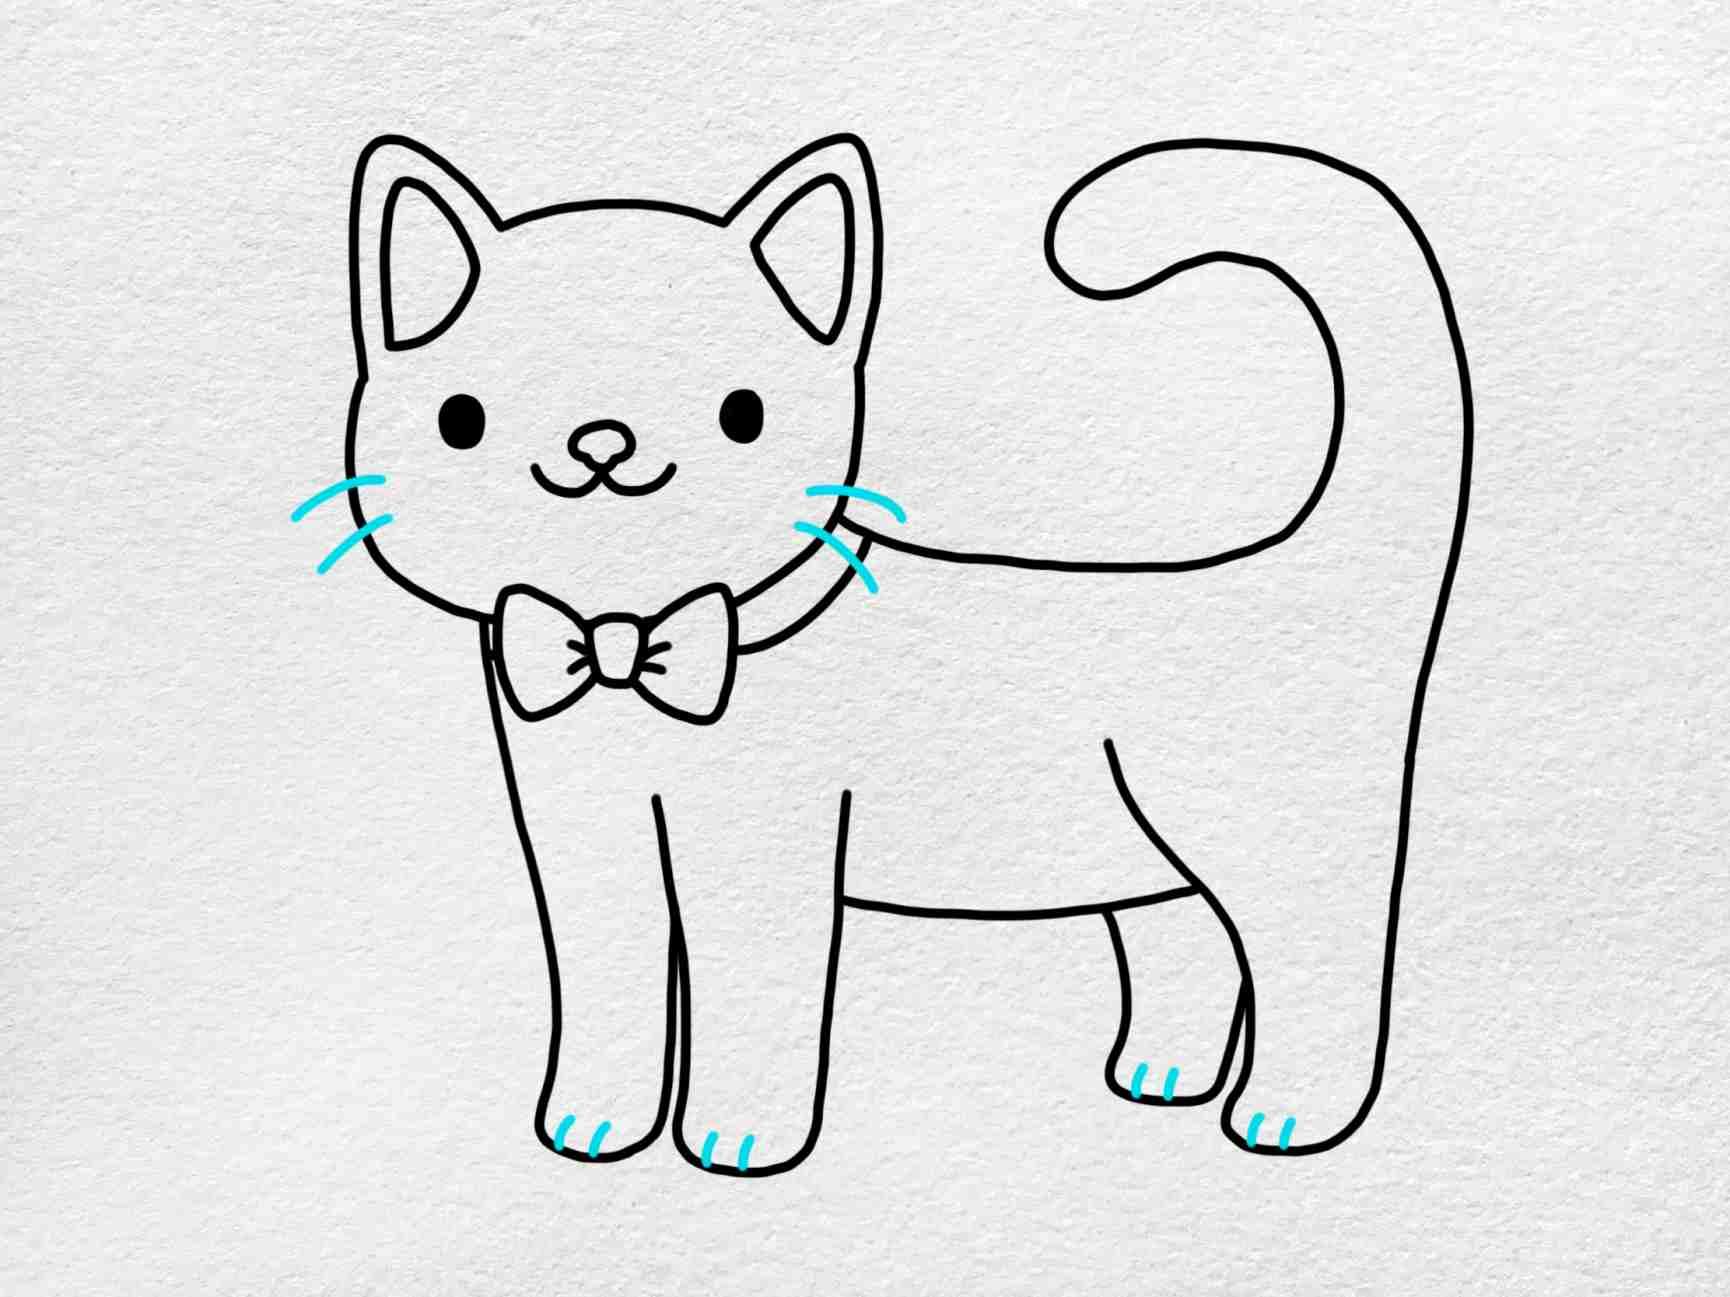 Cute Kitty Drawing: Step 5